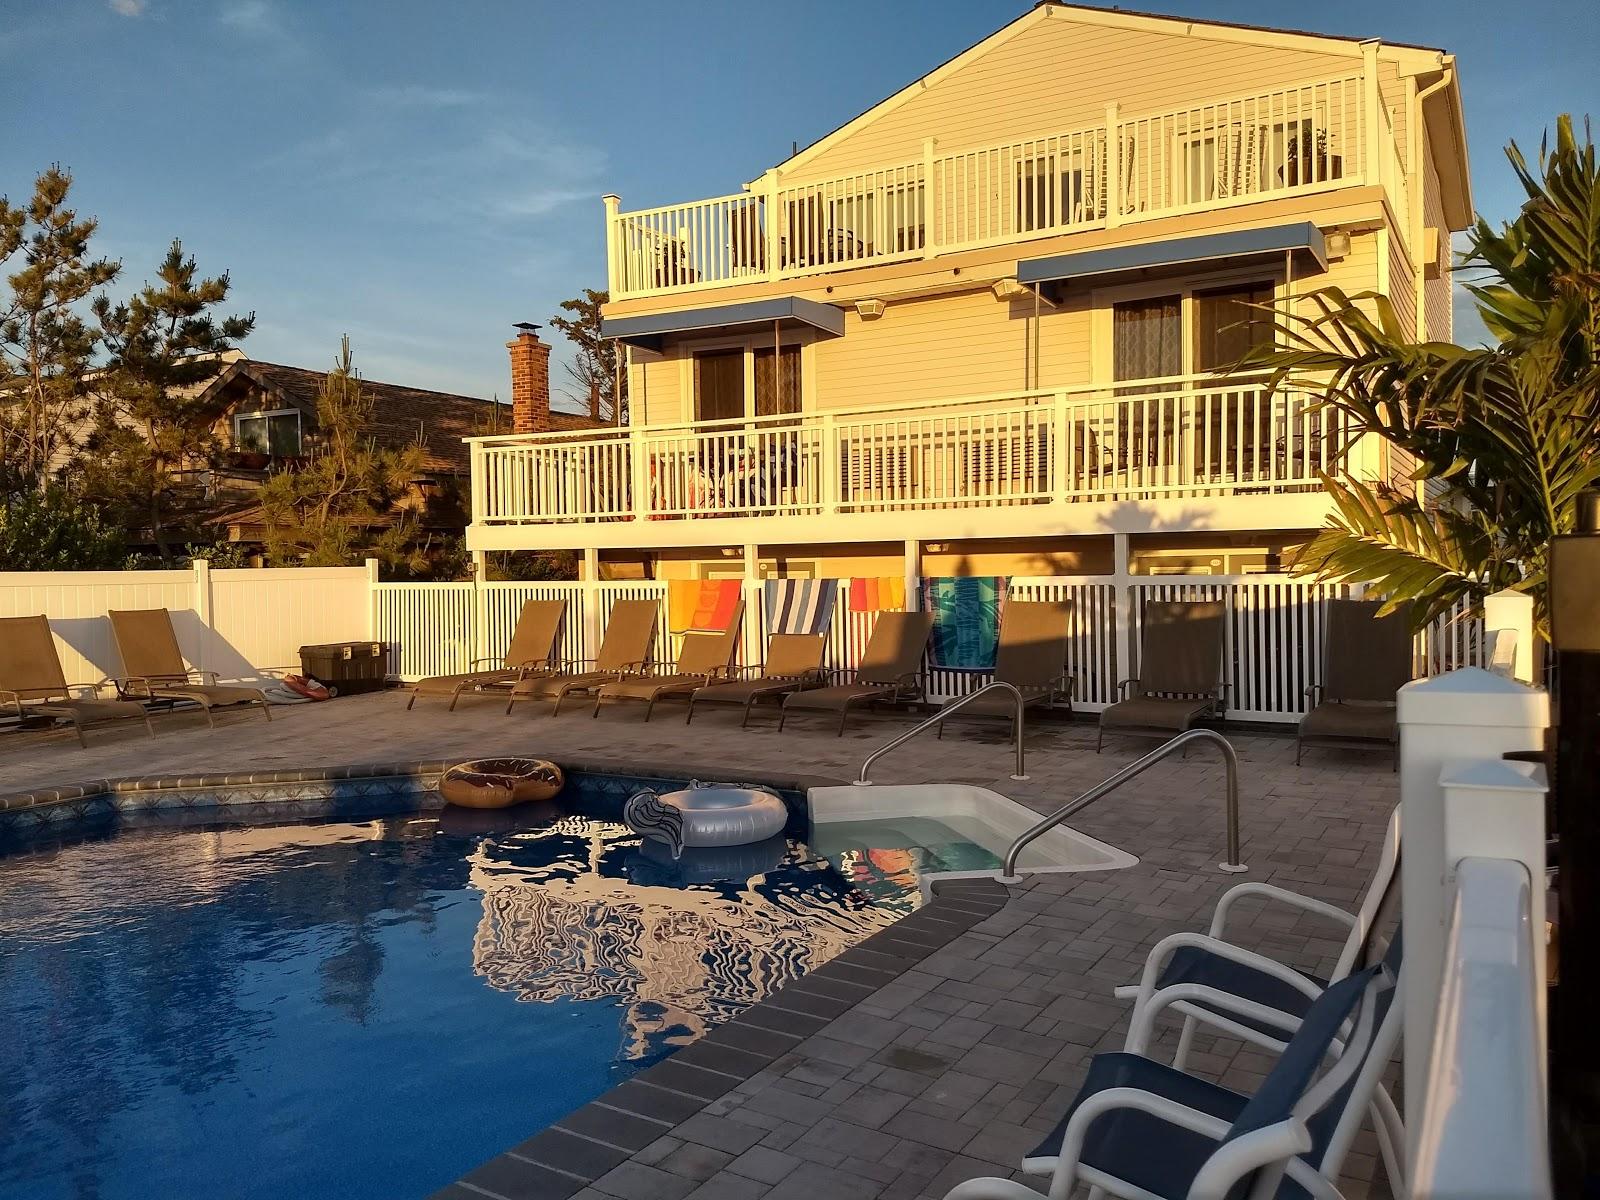 driftwood motel point pleasant beach new jersey tripcarta. Black Bedroom Furniture Sets. Home Design Ideas